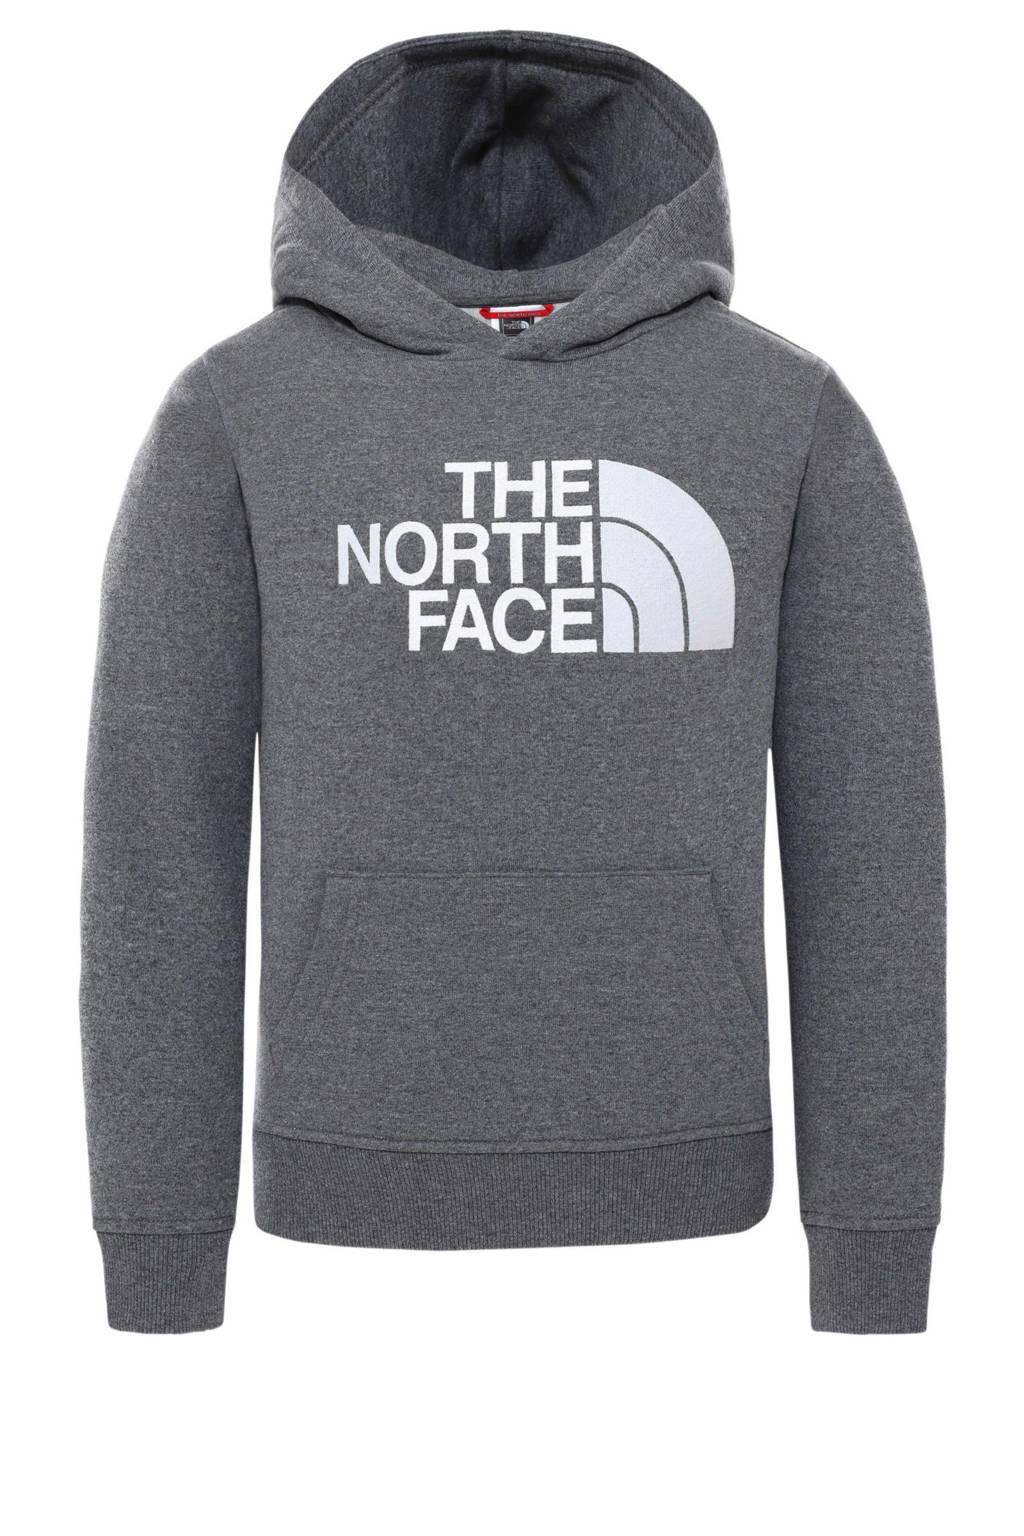 The North Face hoodie grijs/wit, Grijs/wit